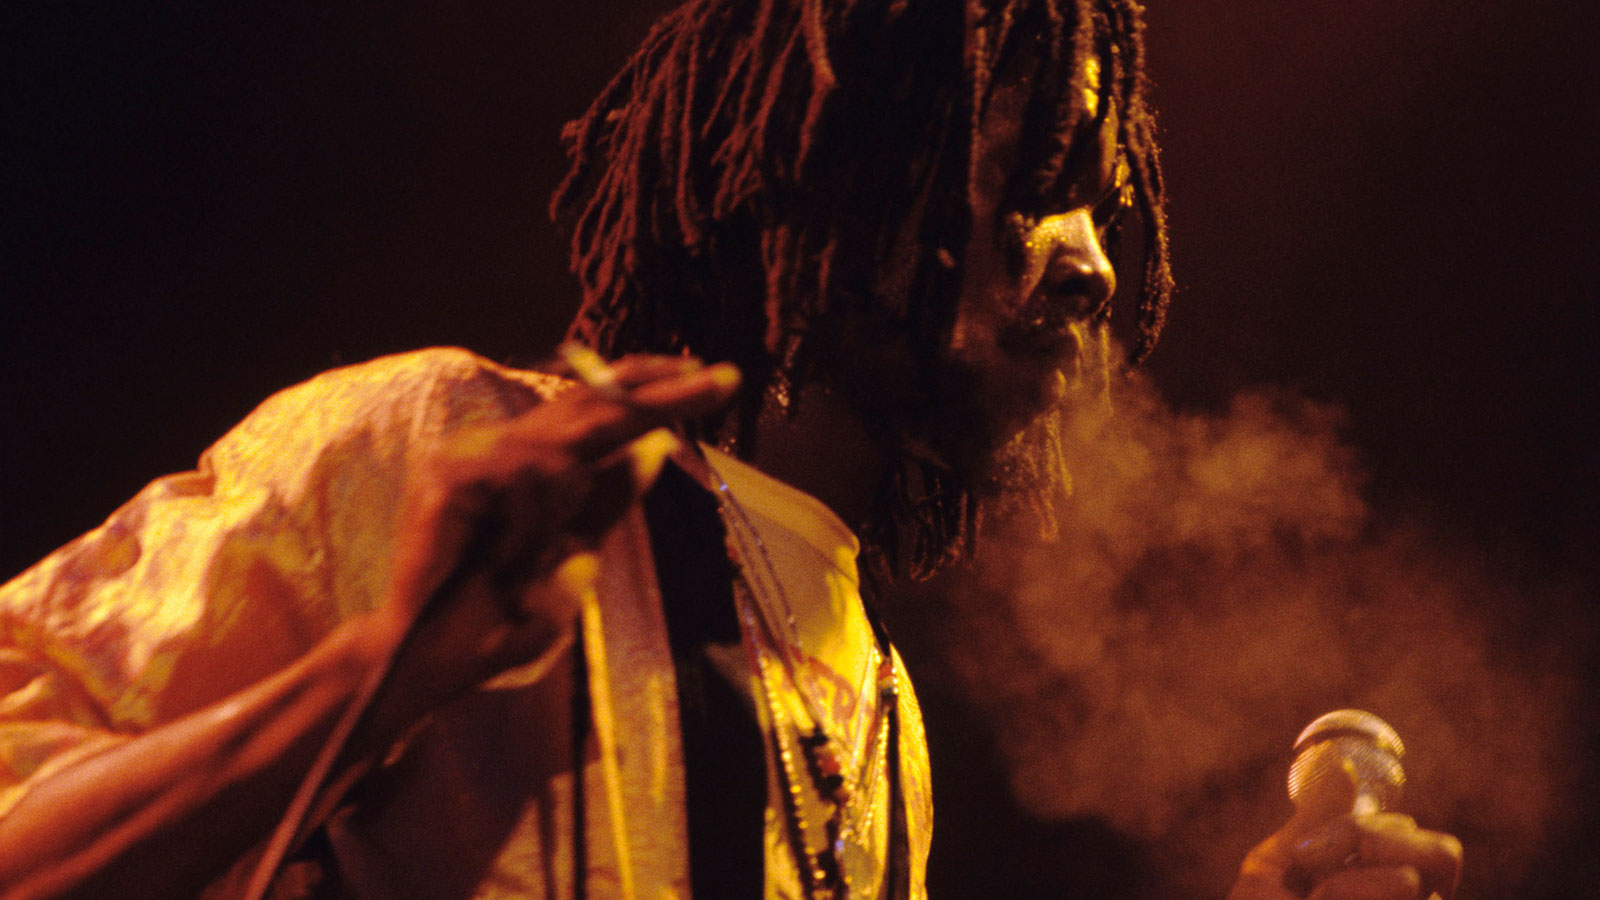 Rastafari Knowledge: Speech on Spirituality- Material and Spiritual progress